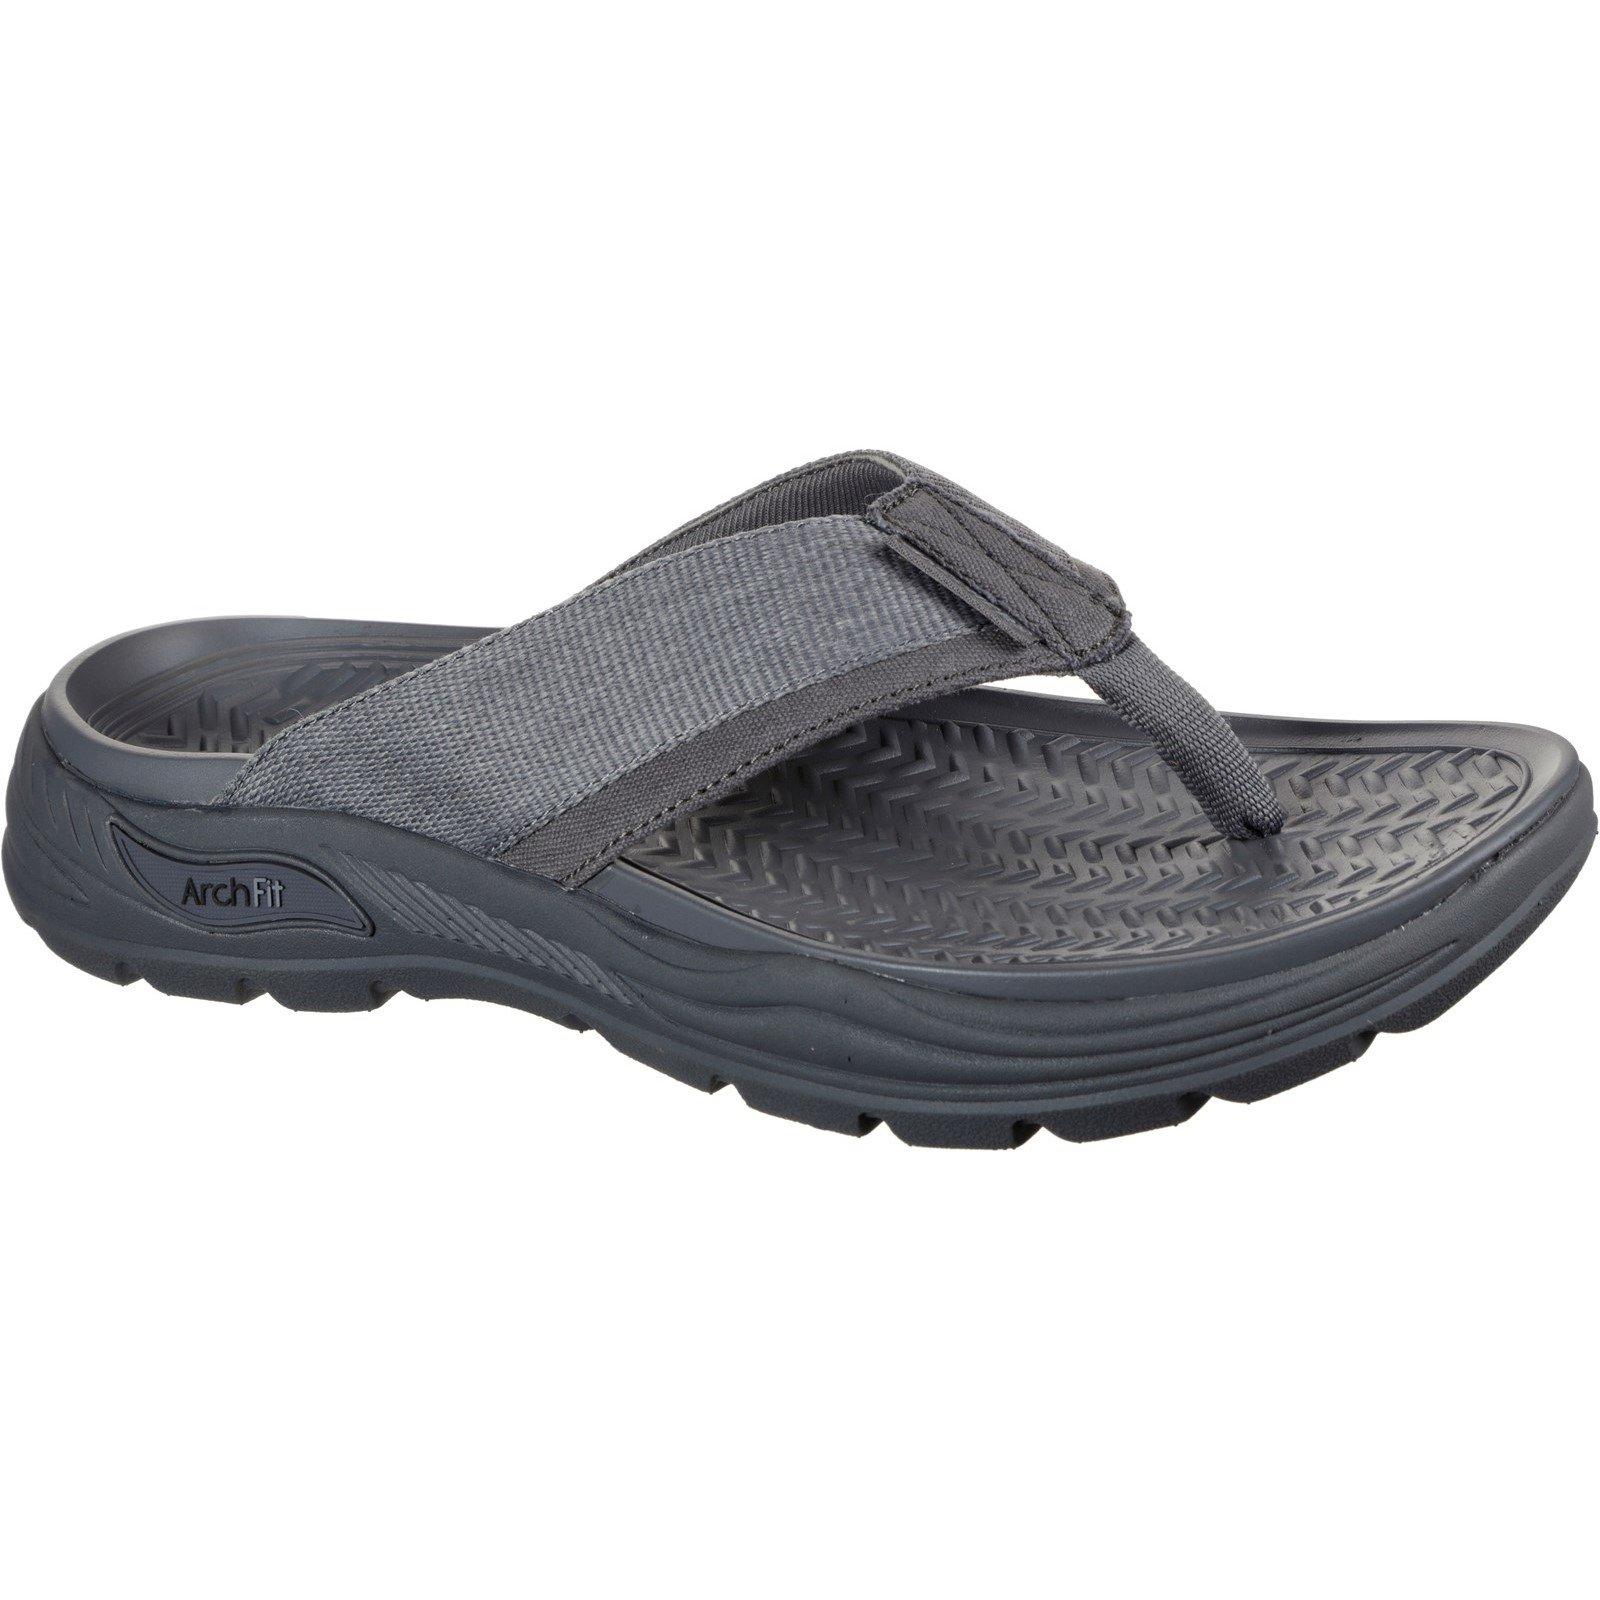 Skechers Men's Arch Fit Motley Dolano Summer Sandal Charcoal 32209 - Charcoal 11